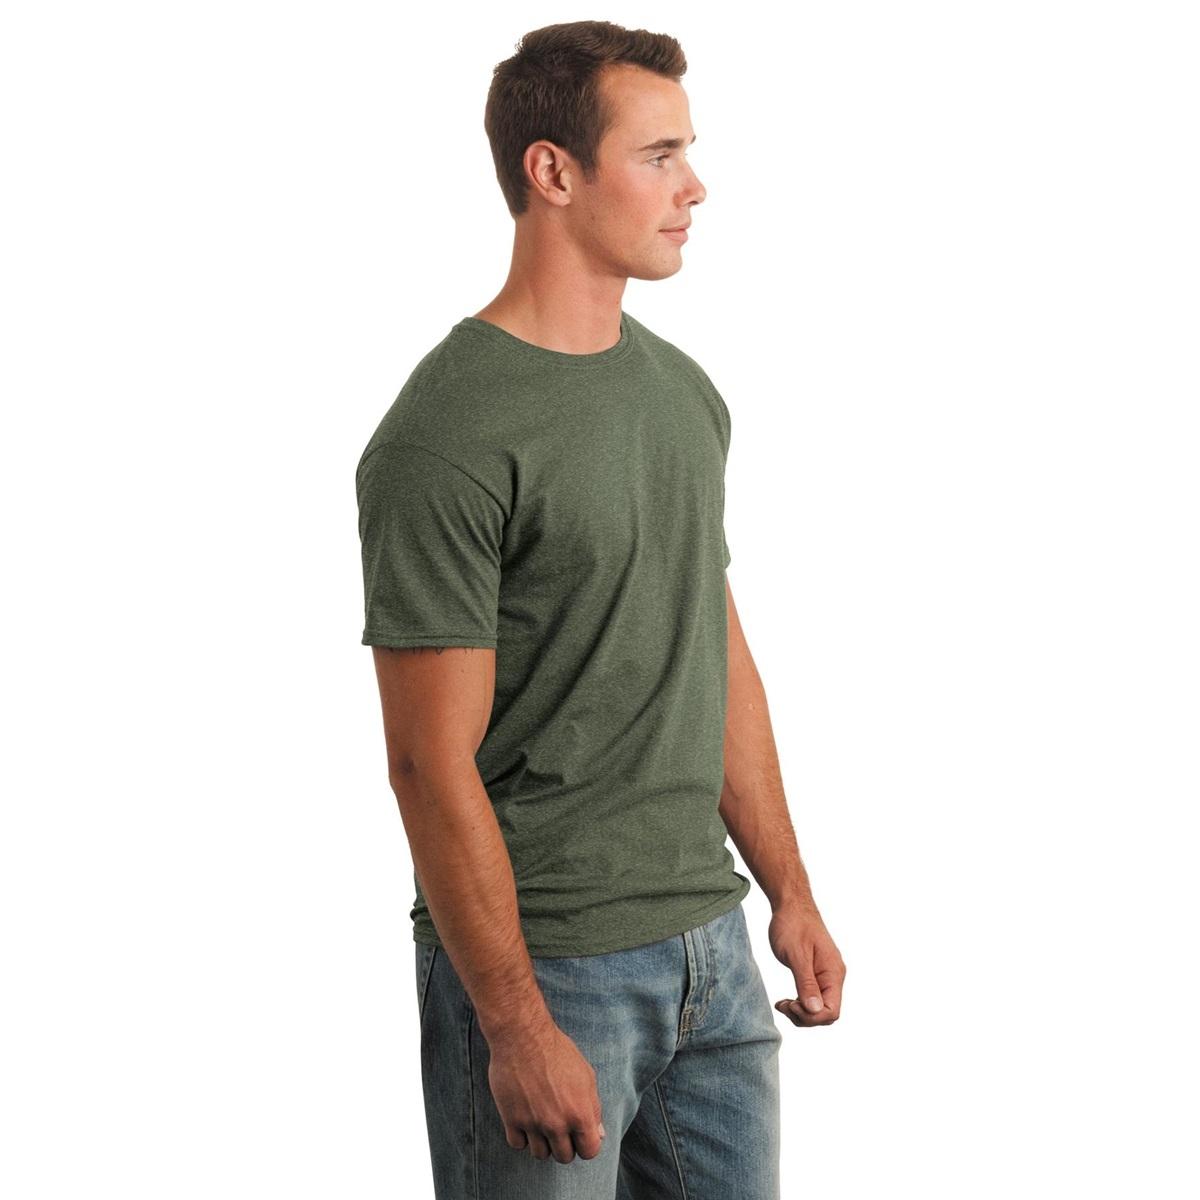 Gildan 64000 Softstyle T Shirt Heather Military Green